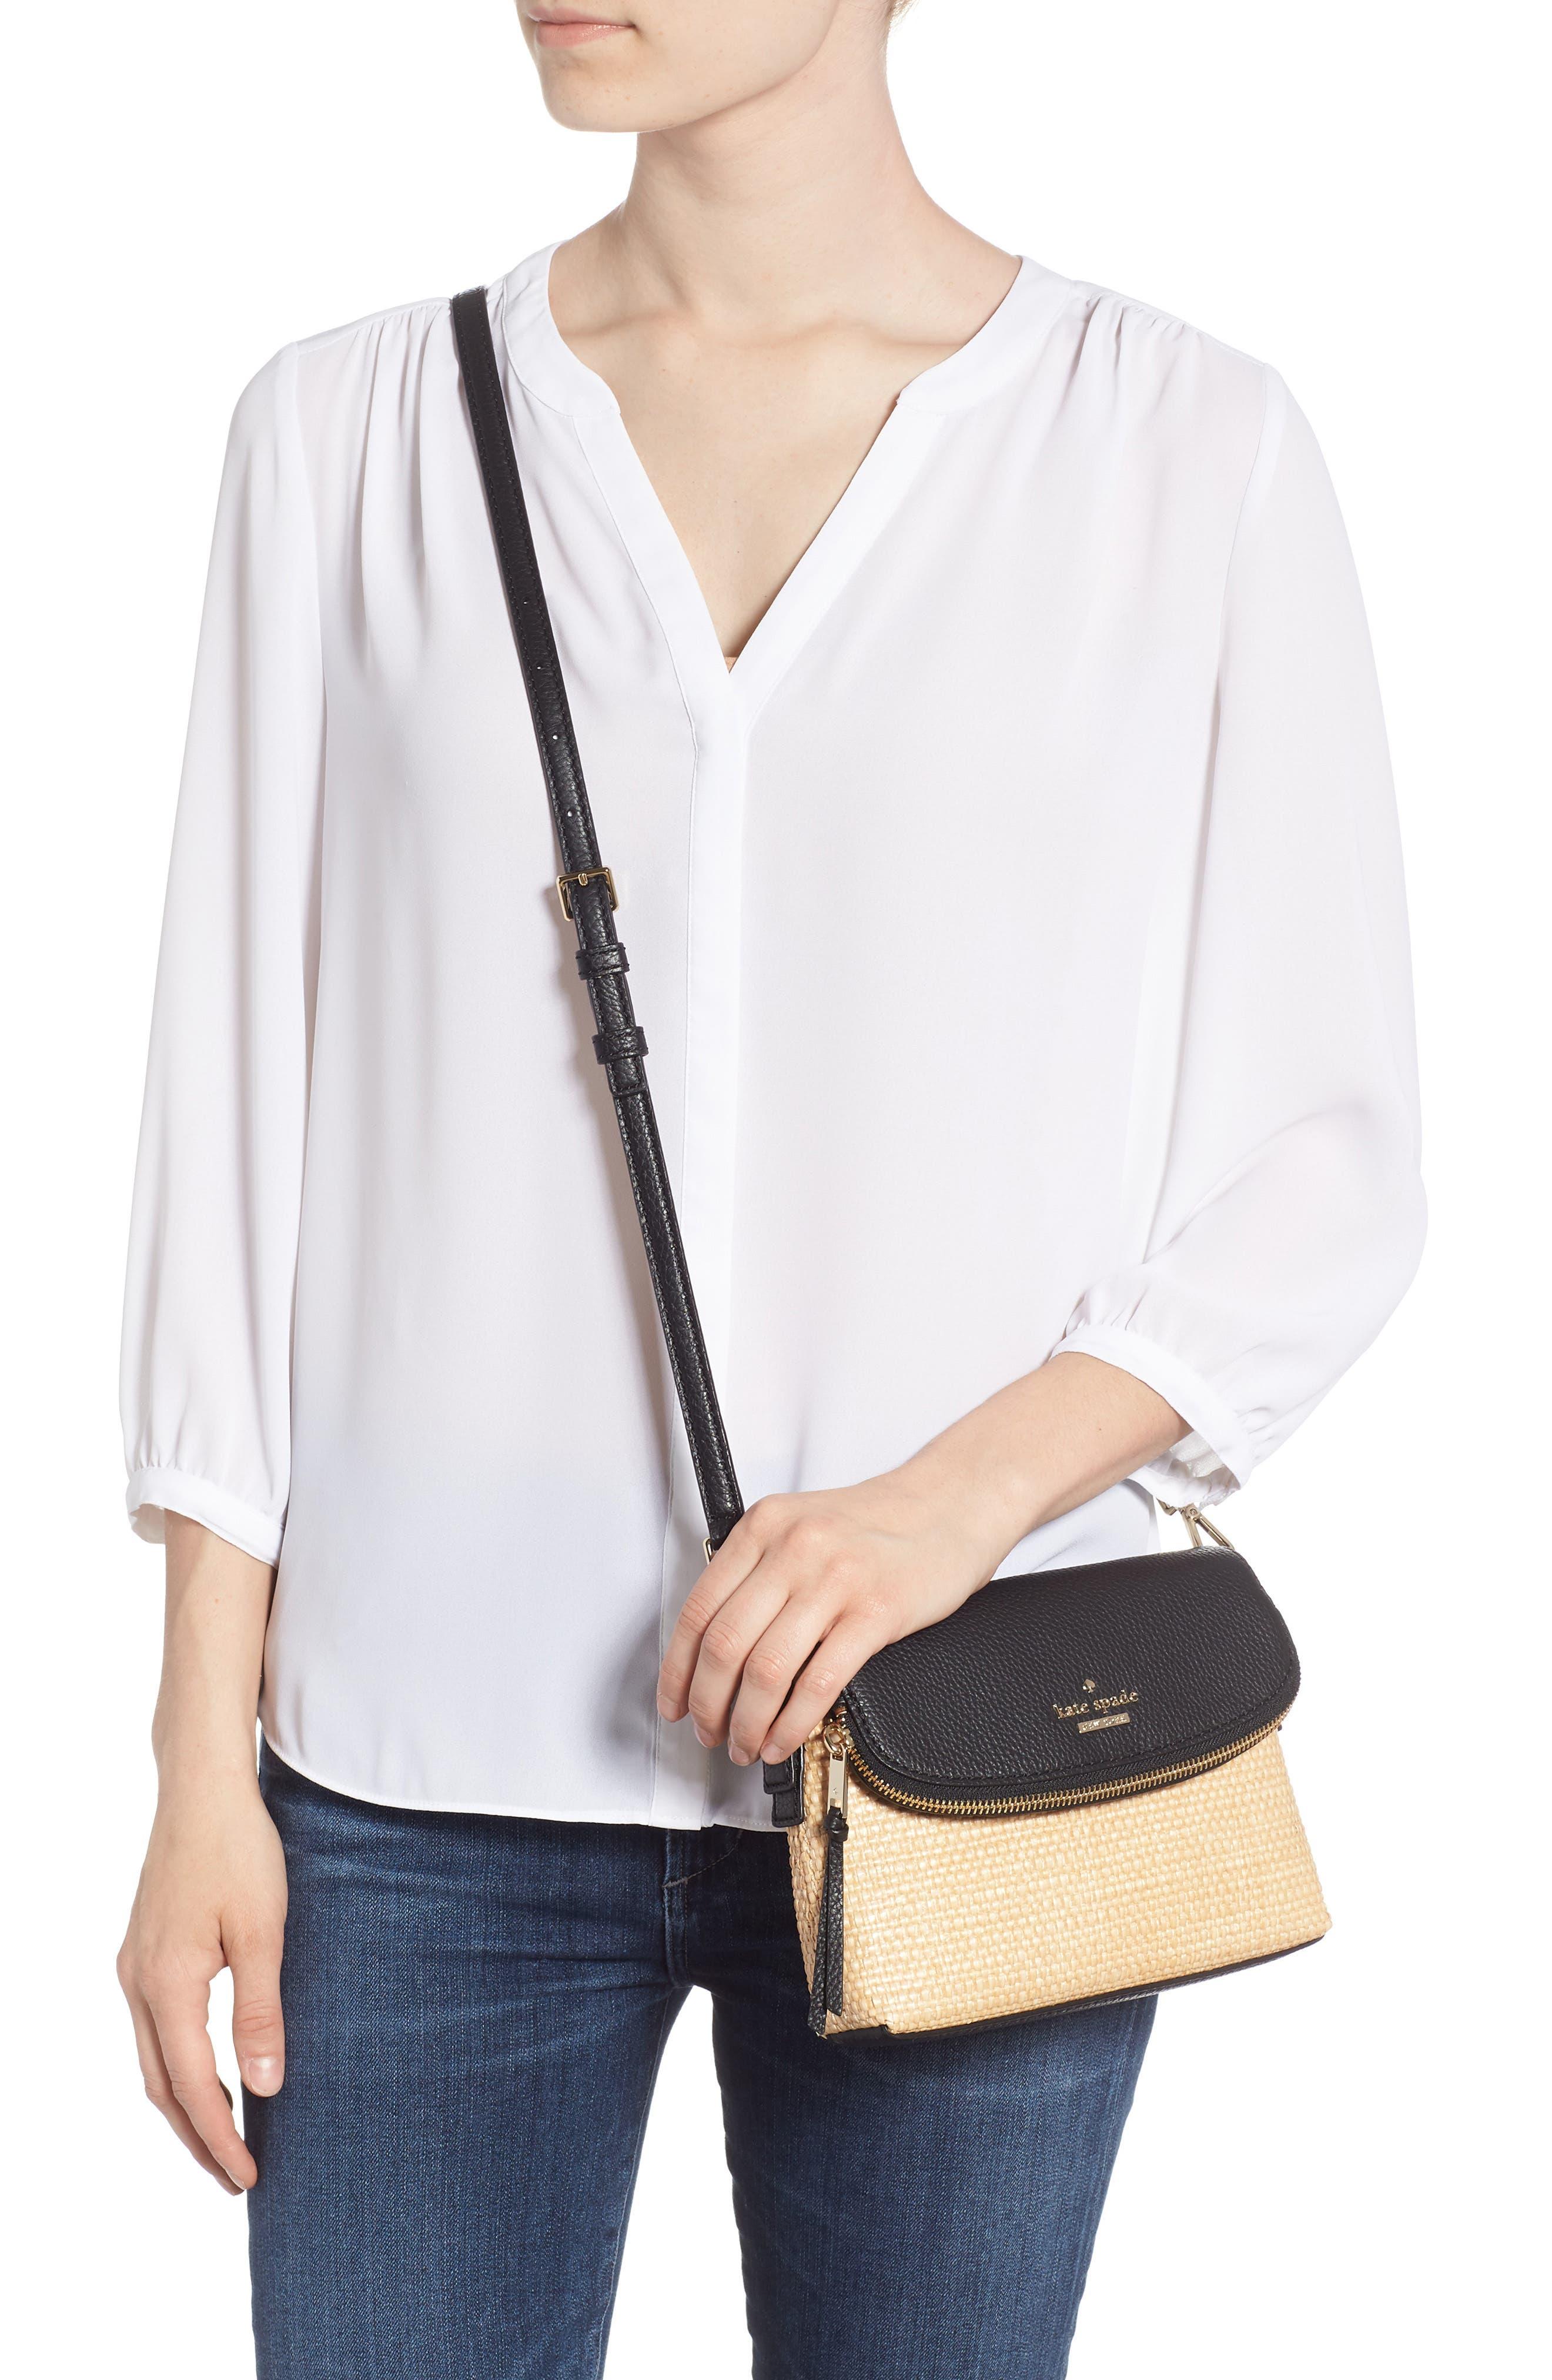 jackson street – harlyn straw & leather crossbody bag,                             Alternate thumbnail 2, color,                             Light Natural